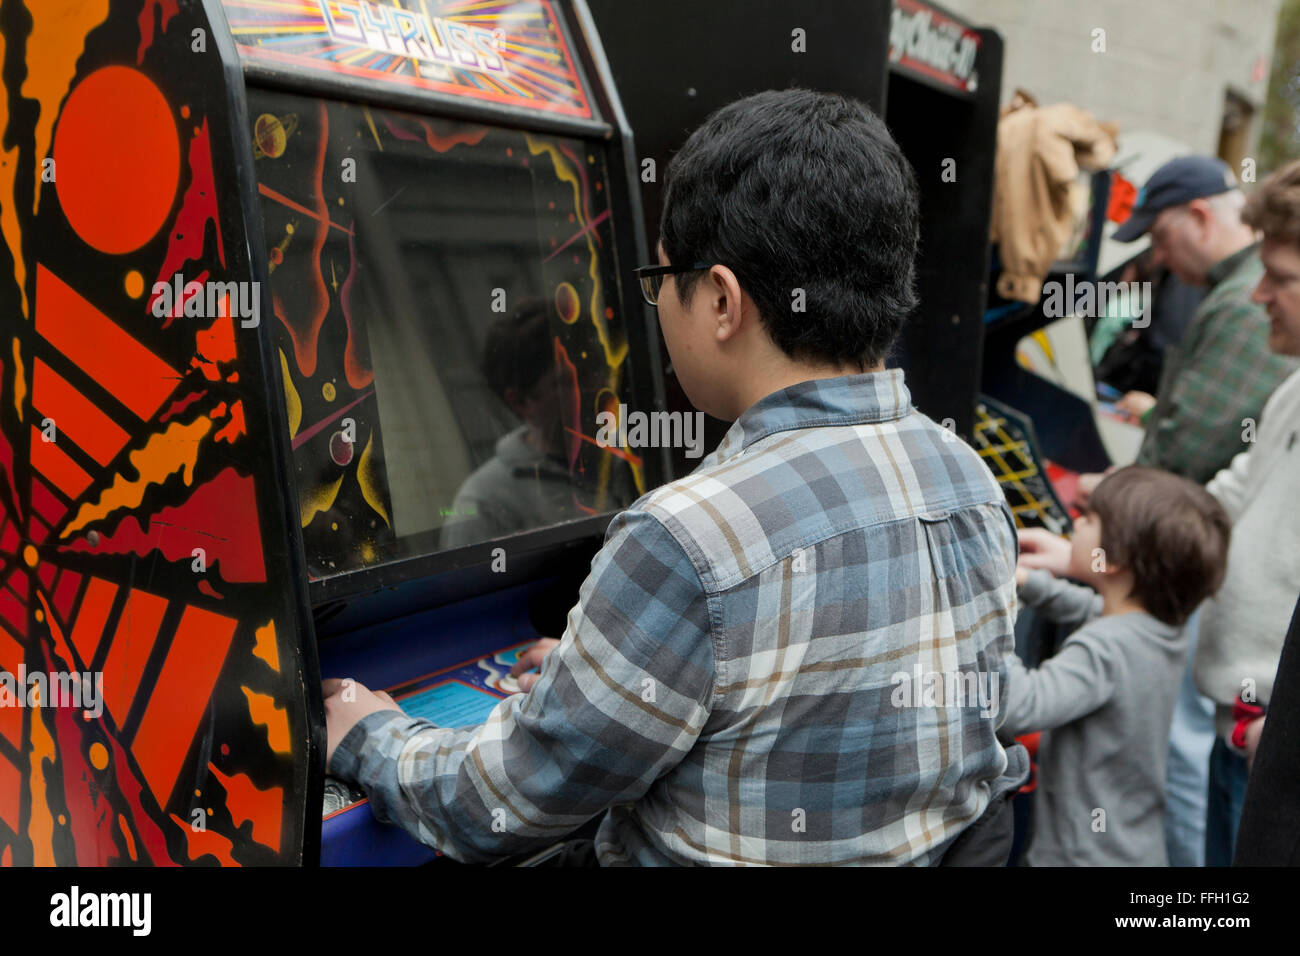 Jeune homme jouant arcade jeu vidéo - USA Photo Stock